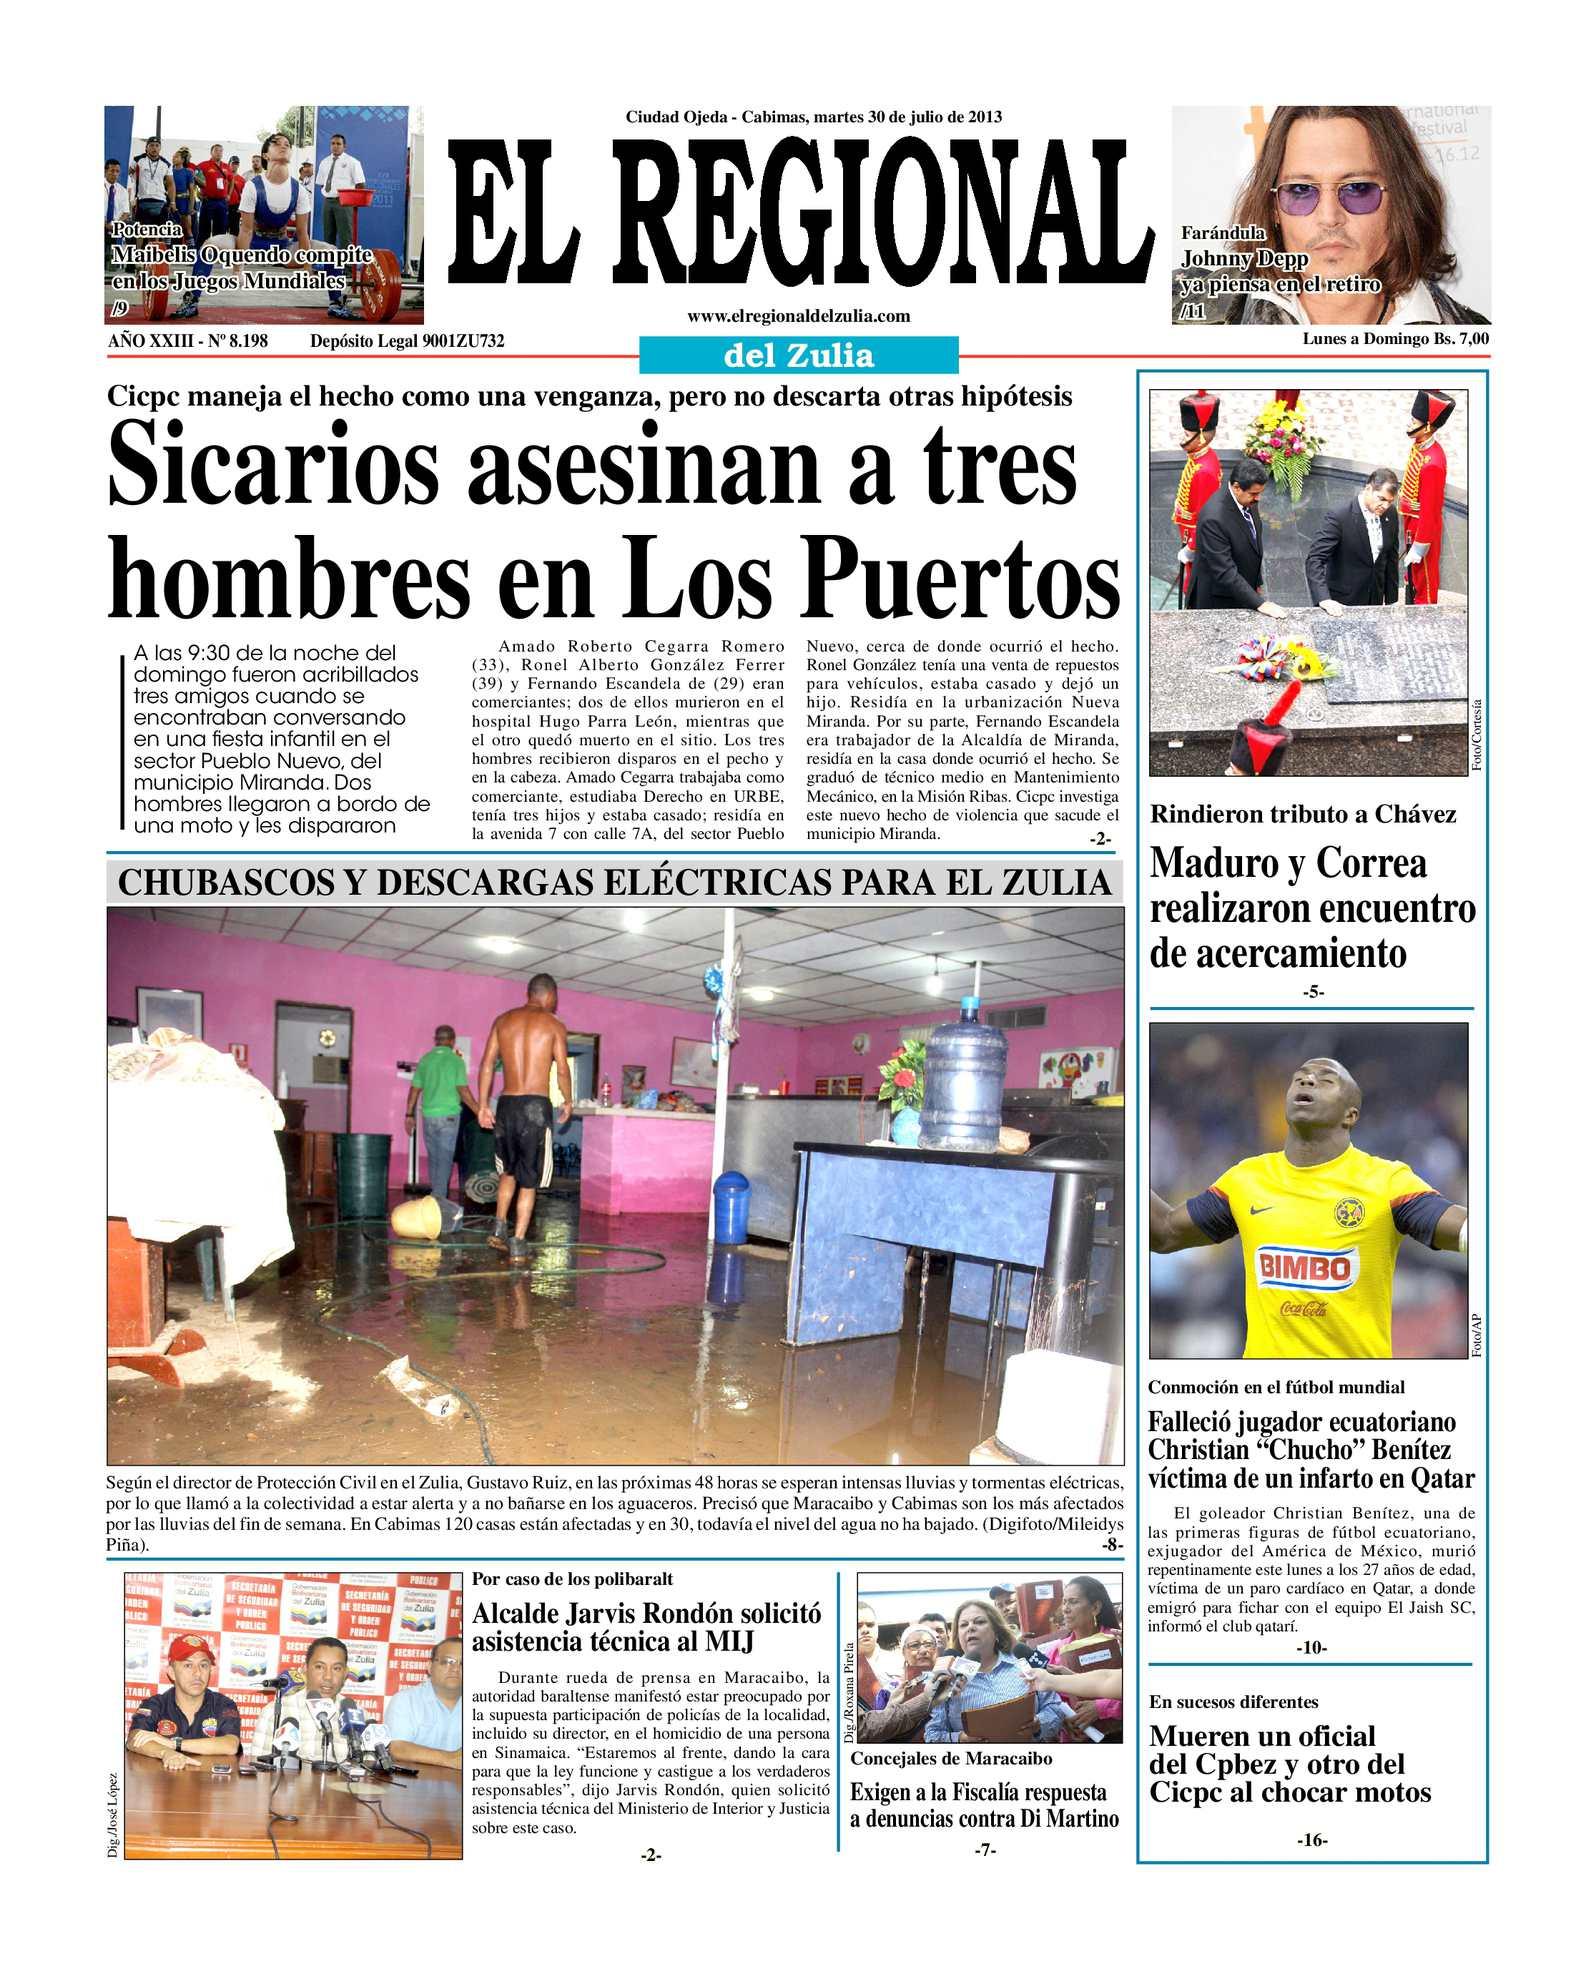 Calaméo - El Regional del Zulia 30-07-2013